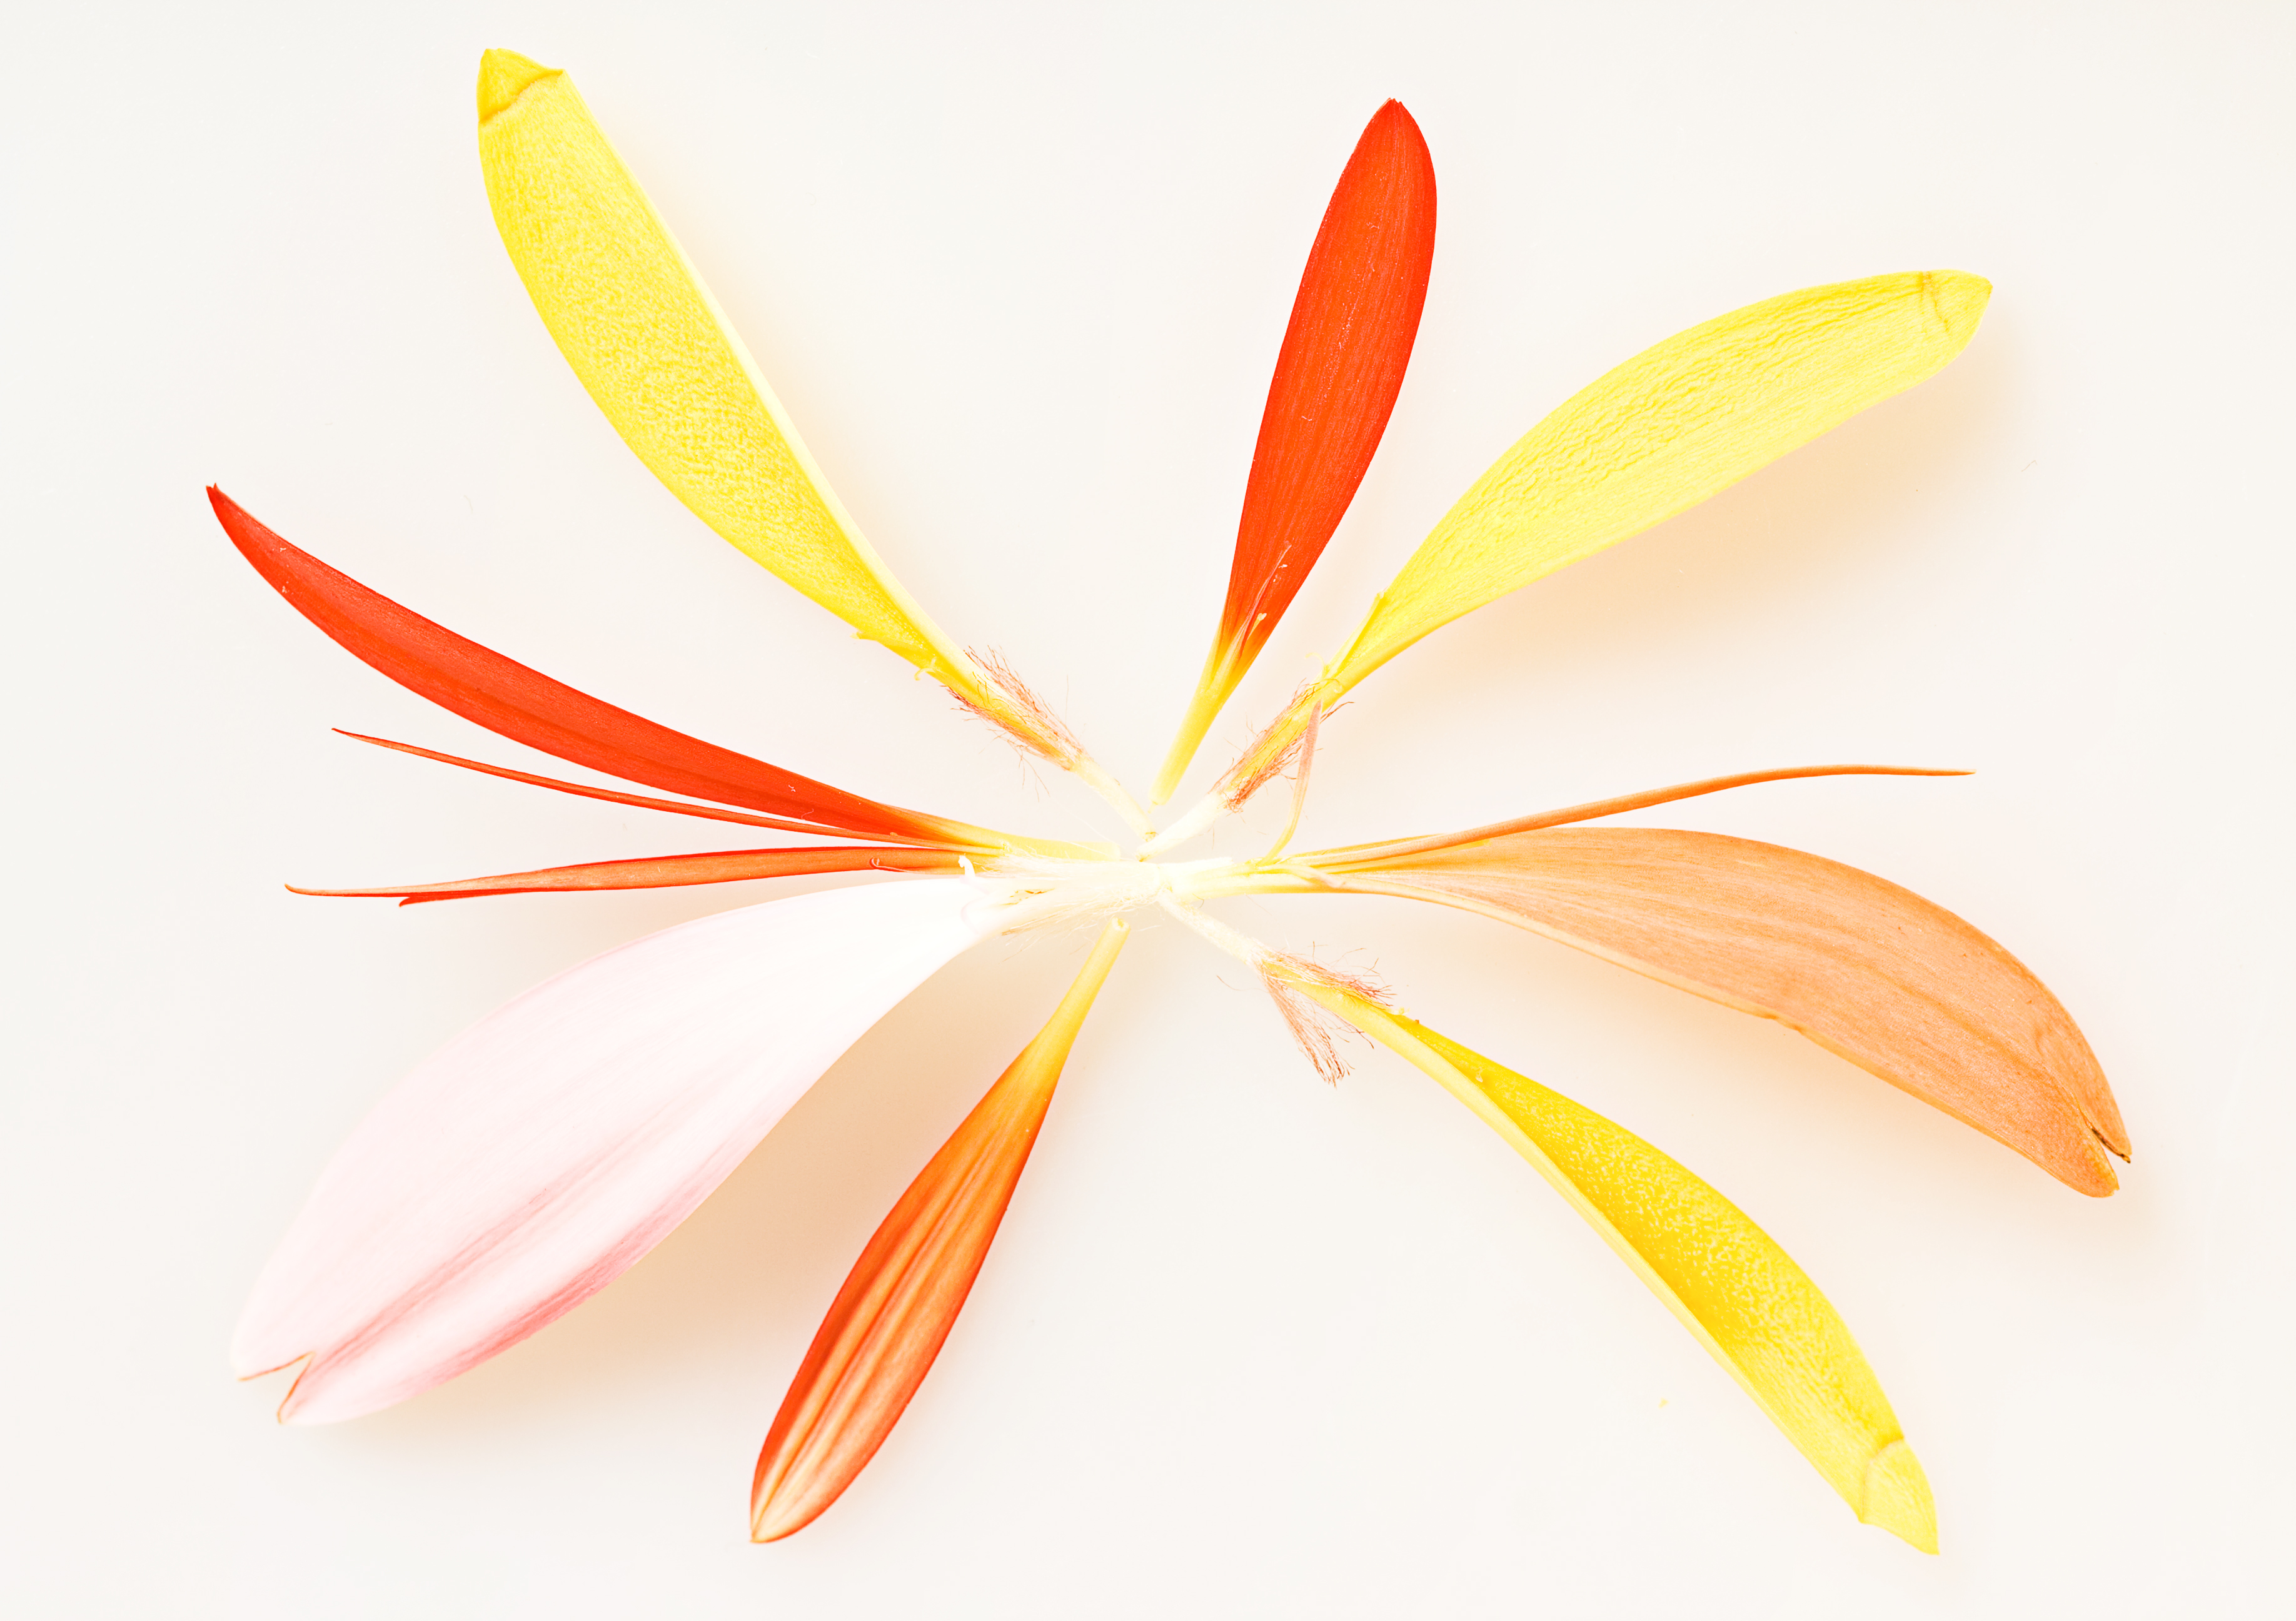 Flower petals, Colors, Nature, Seeds, Round, HQ Photo